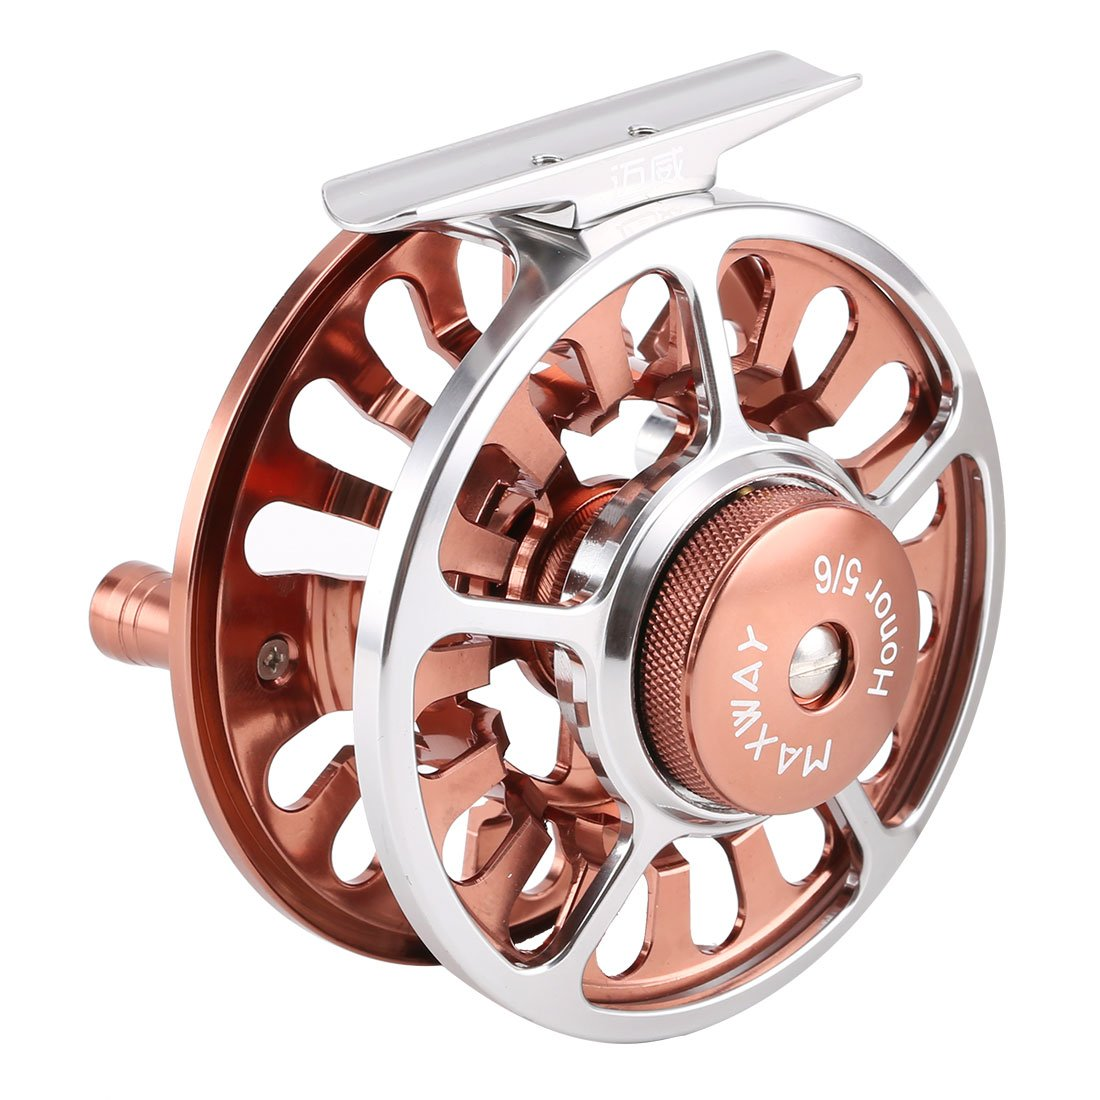 SeaKnight MAXWAY Honor Fly Reels Super Light 3BB Fly Fishing Reels CNC machined Aluminum Alloy Body Fishing Reel